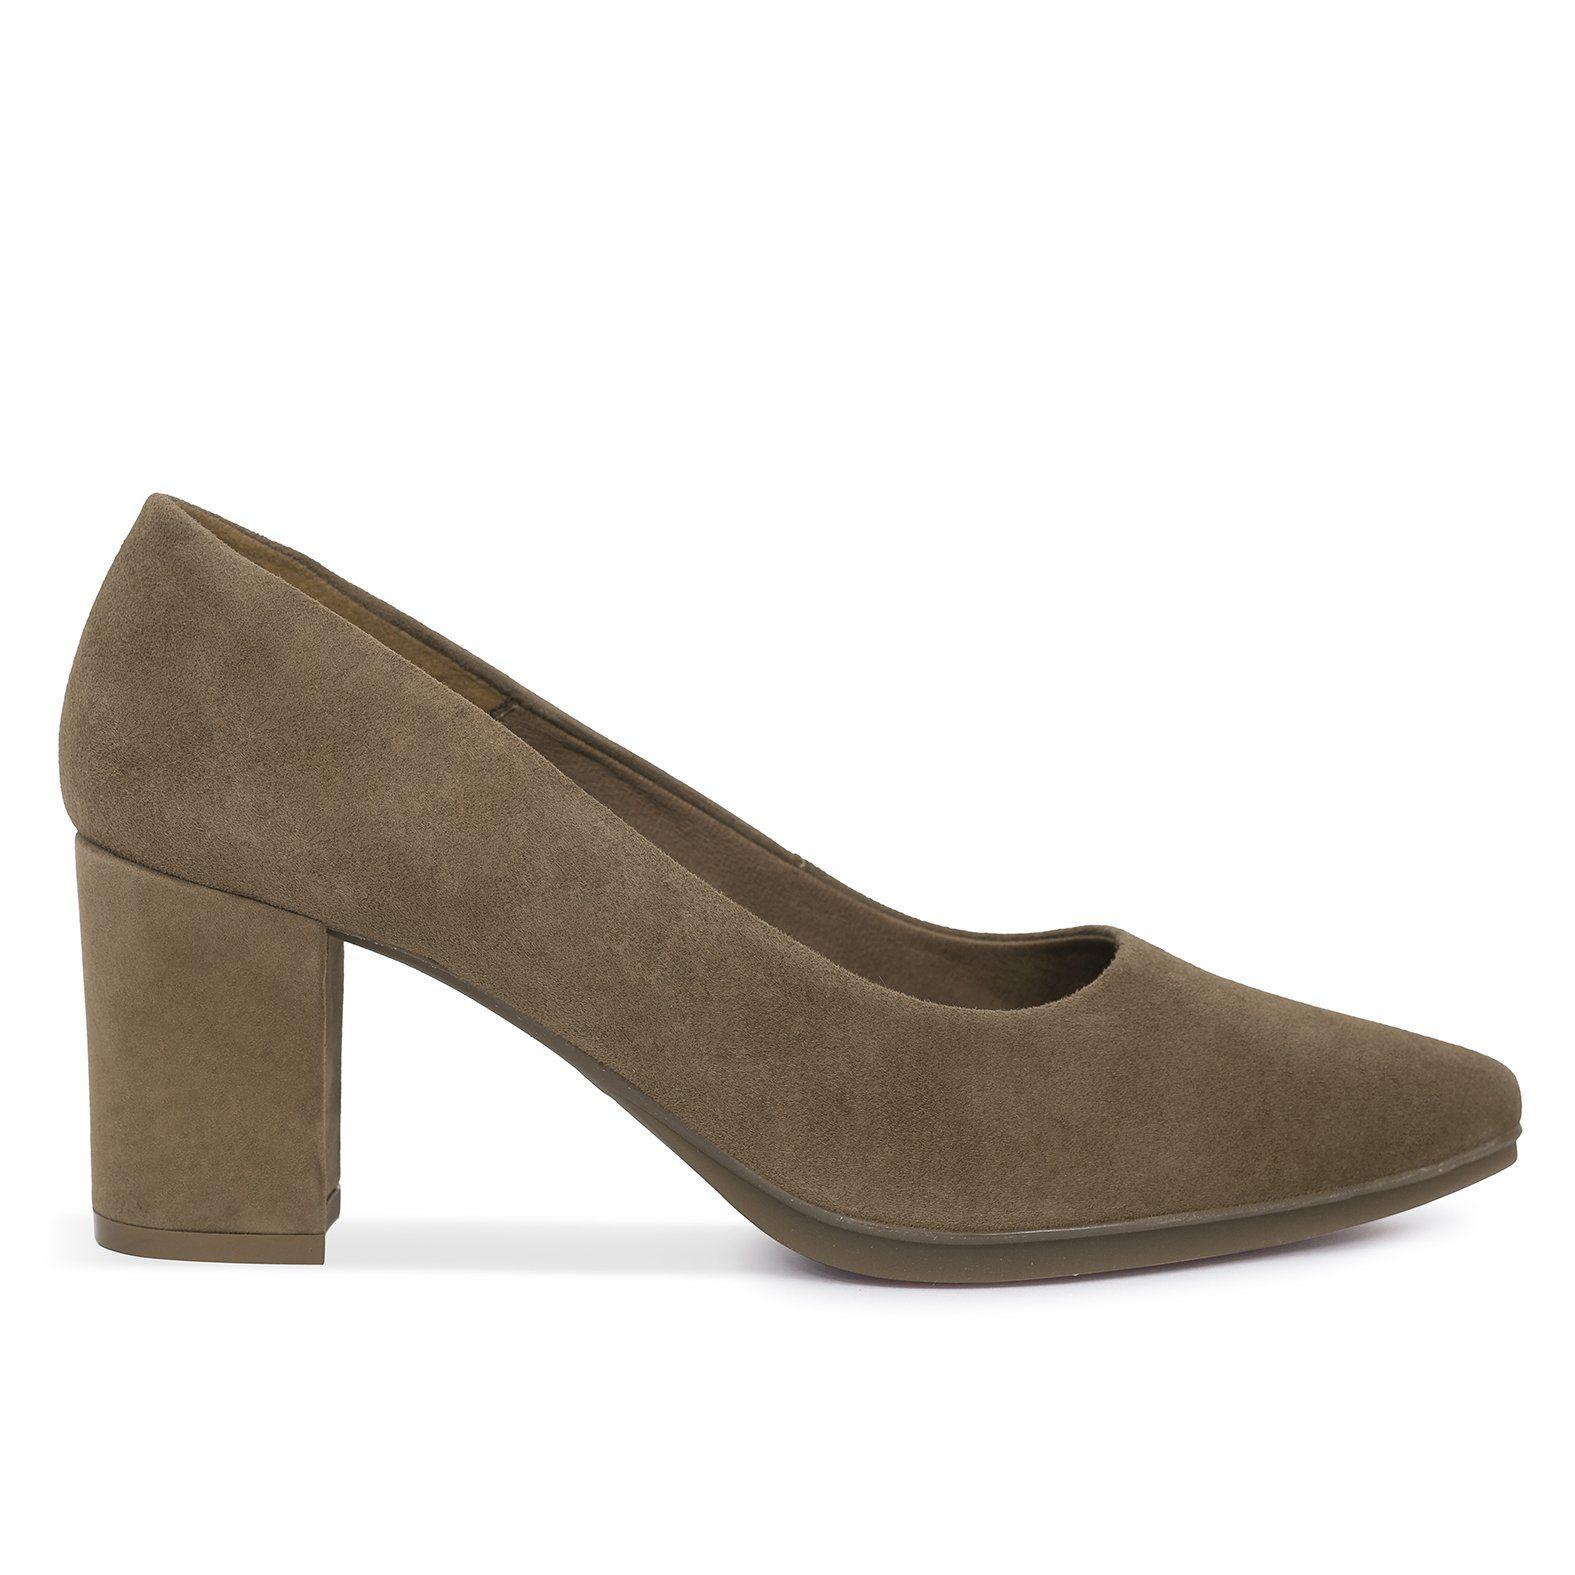 93a1c67e Zapatos mujer tacón bajo BEIGE VISÓN Urban S - Zapatos online miMaO – miMaO  ShopOnline